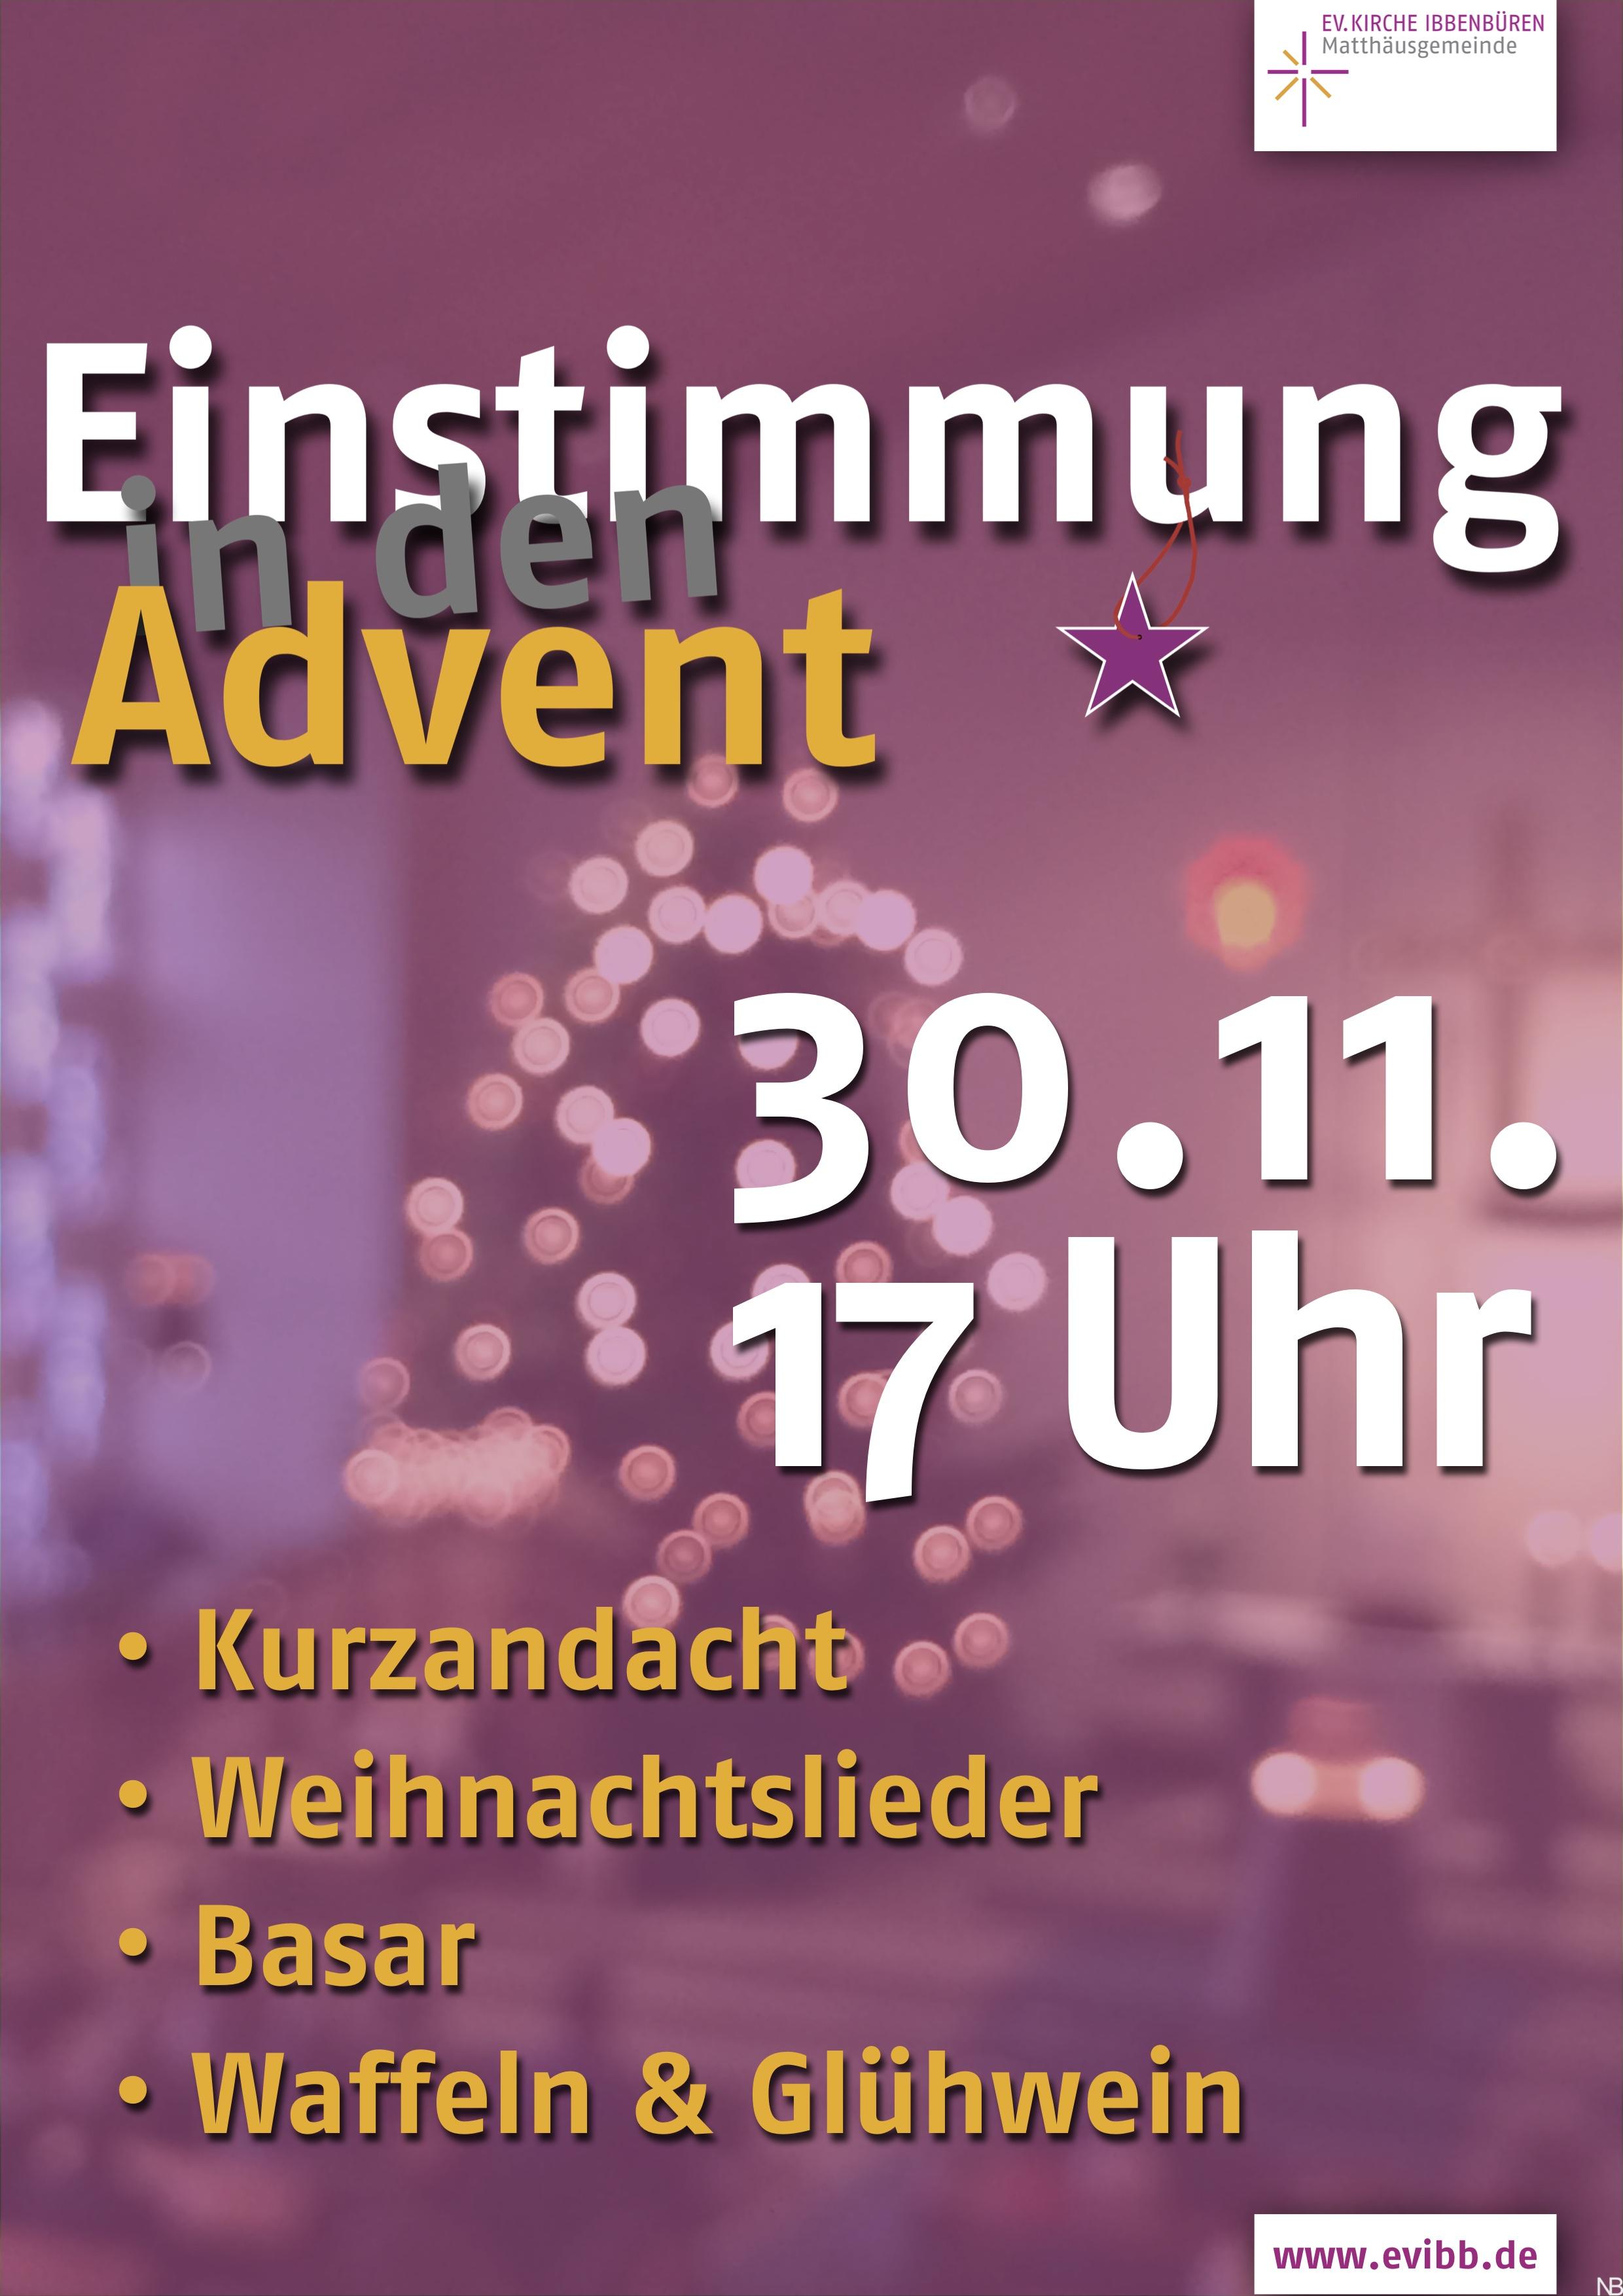 20161125_Einstimmung Advent Plakat evibb